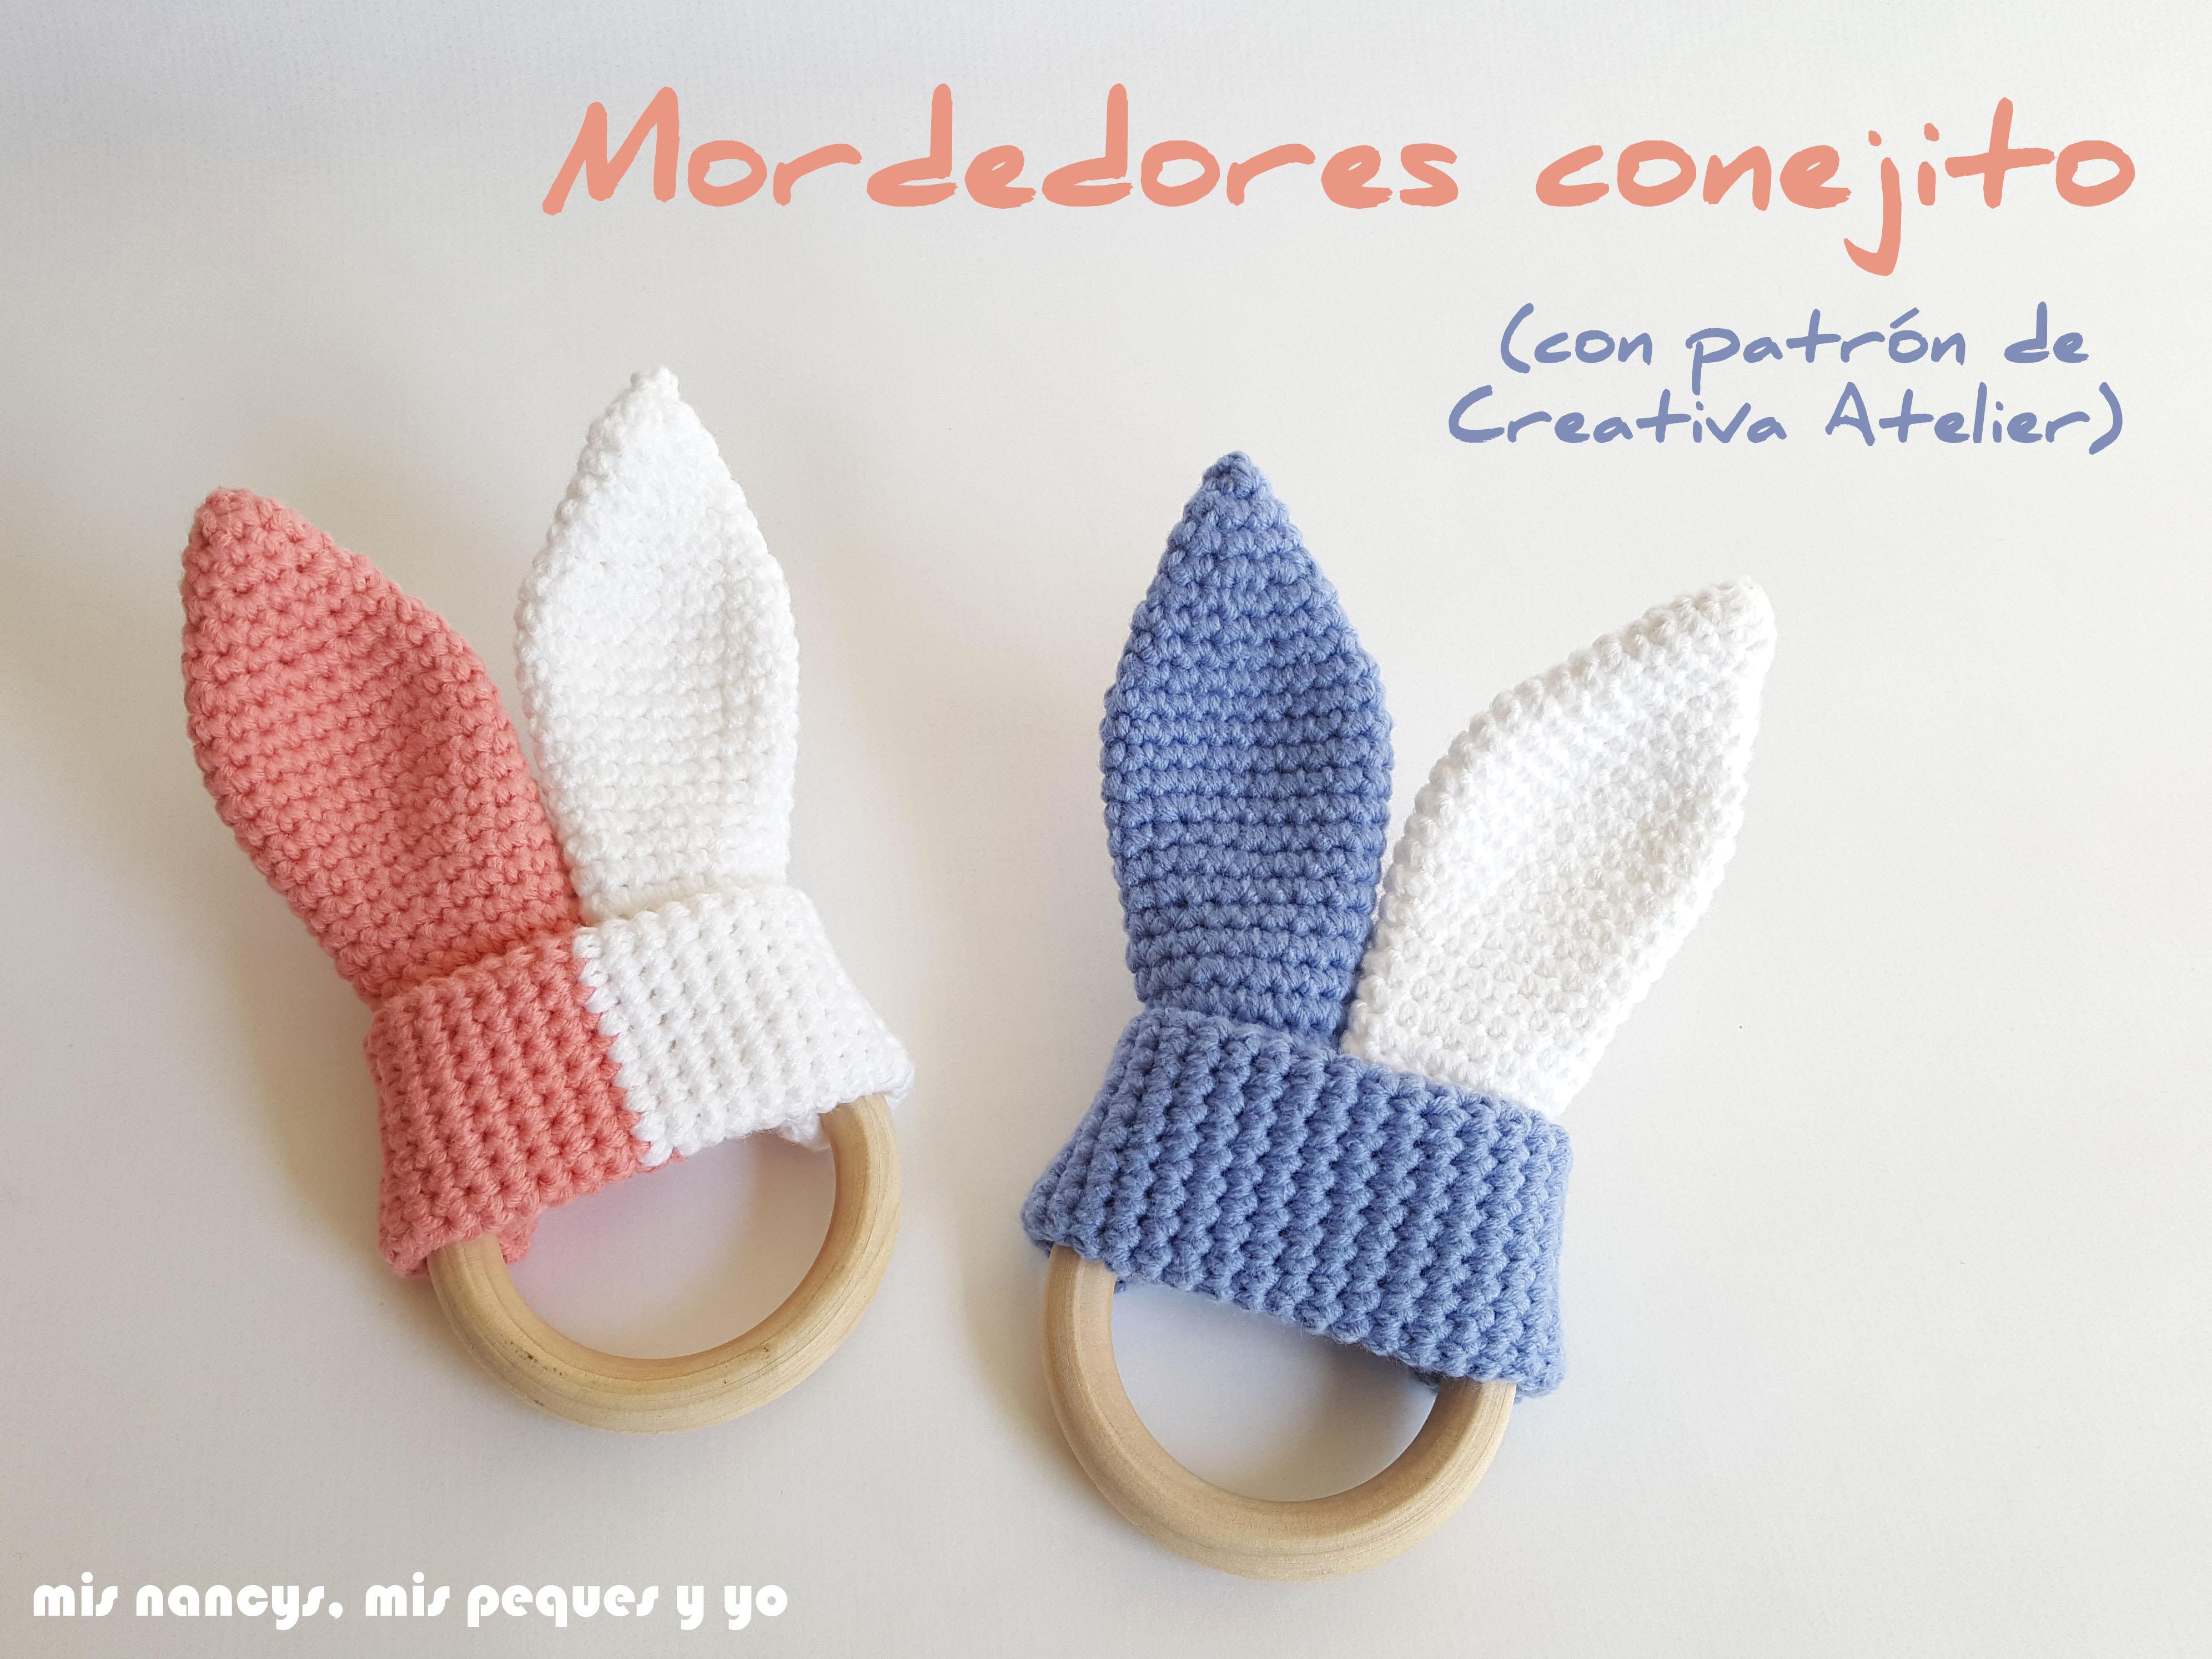 Mordedores conejito de crochet